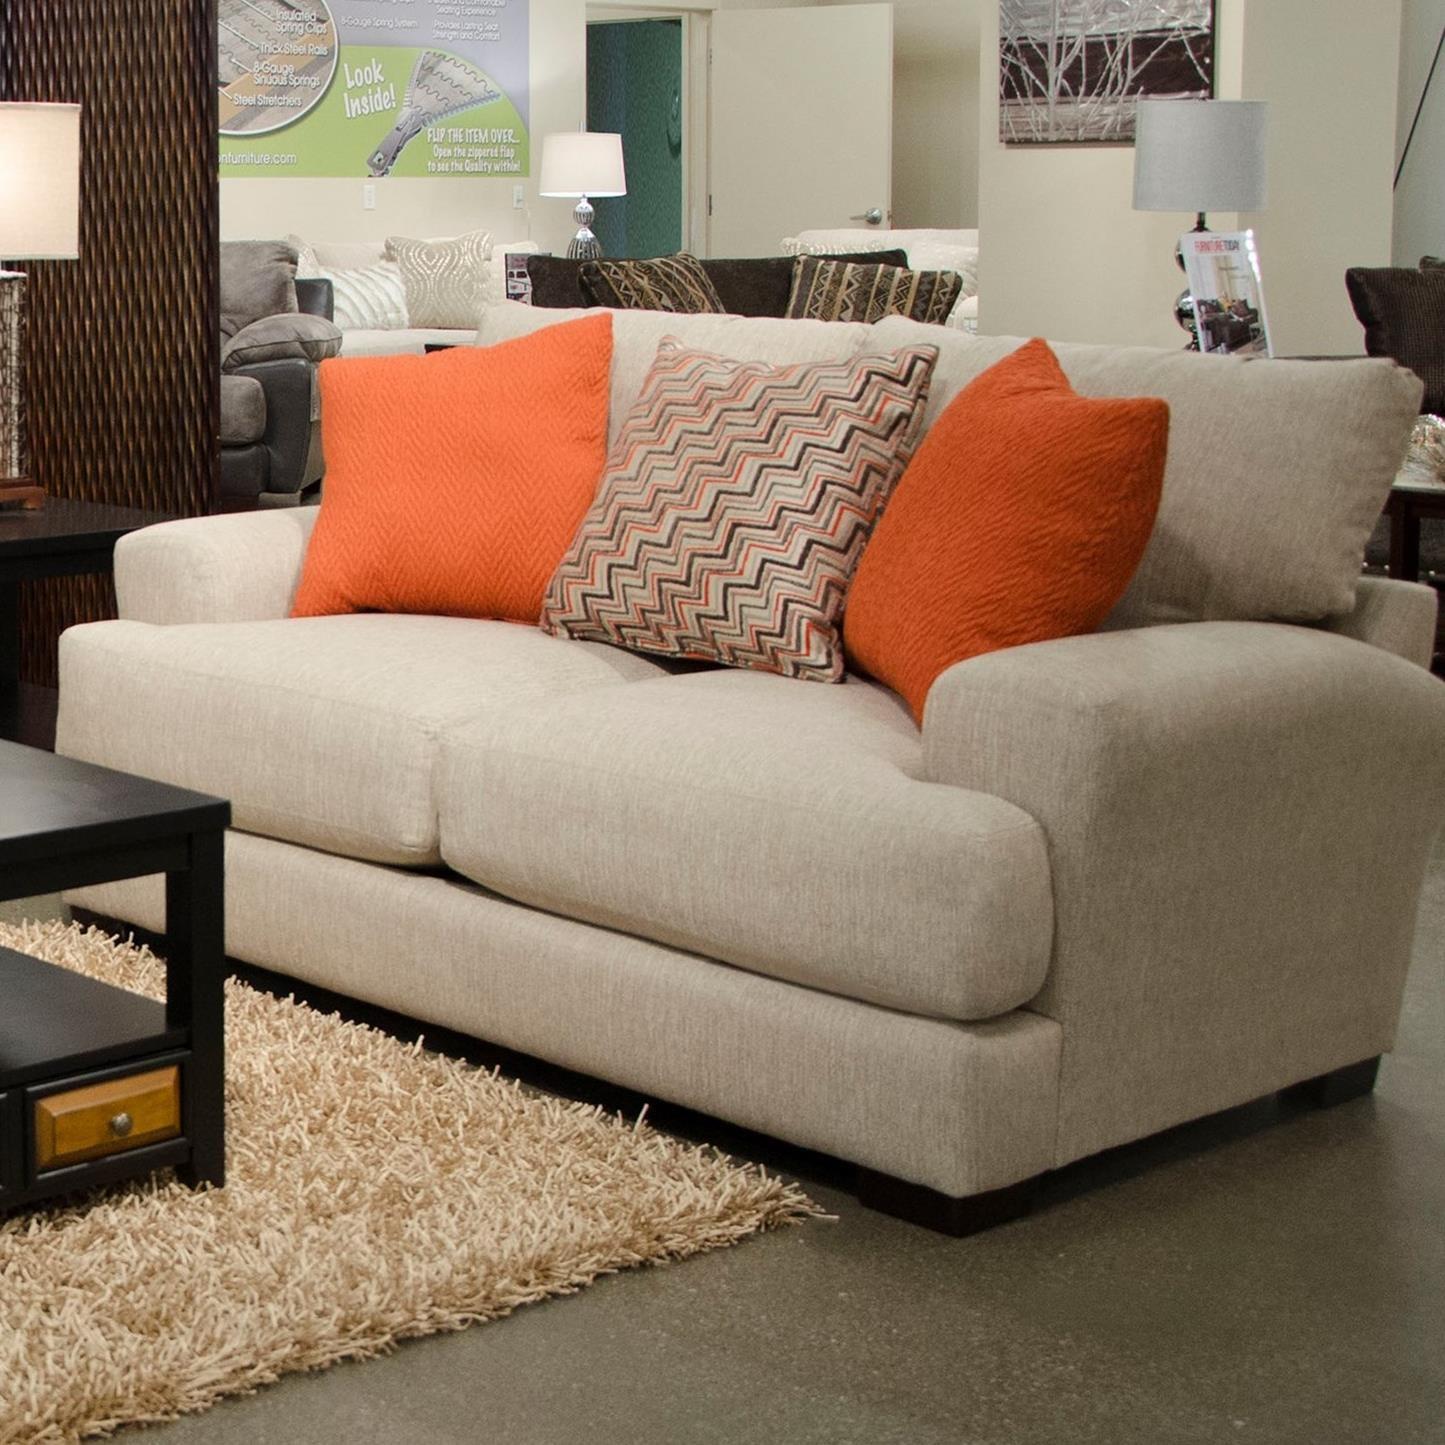 Ava Loveseat w/ USB Port by Jackson Furniture at Lapeer Furniture & Mattress Center